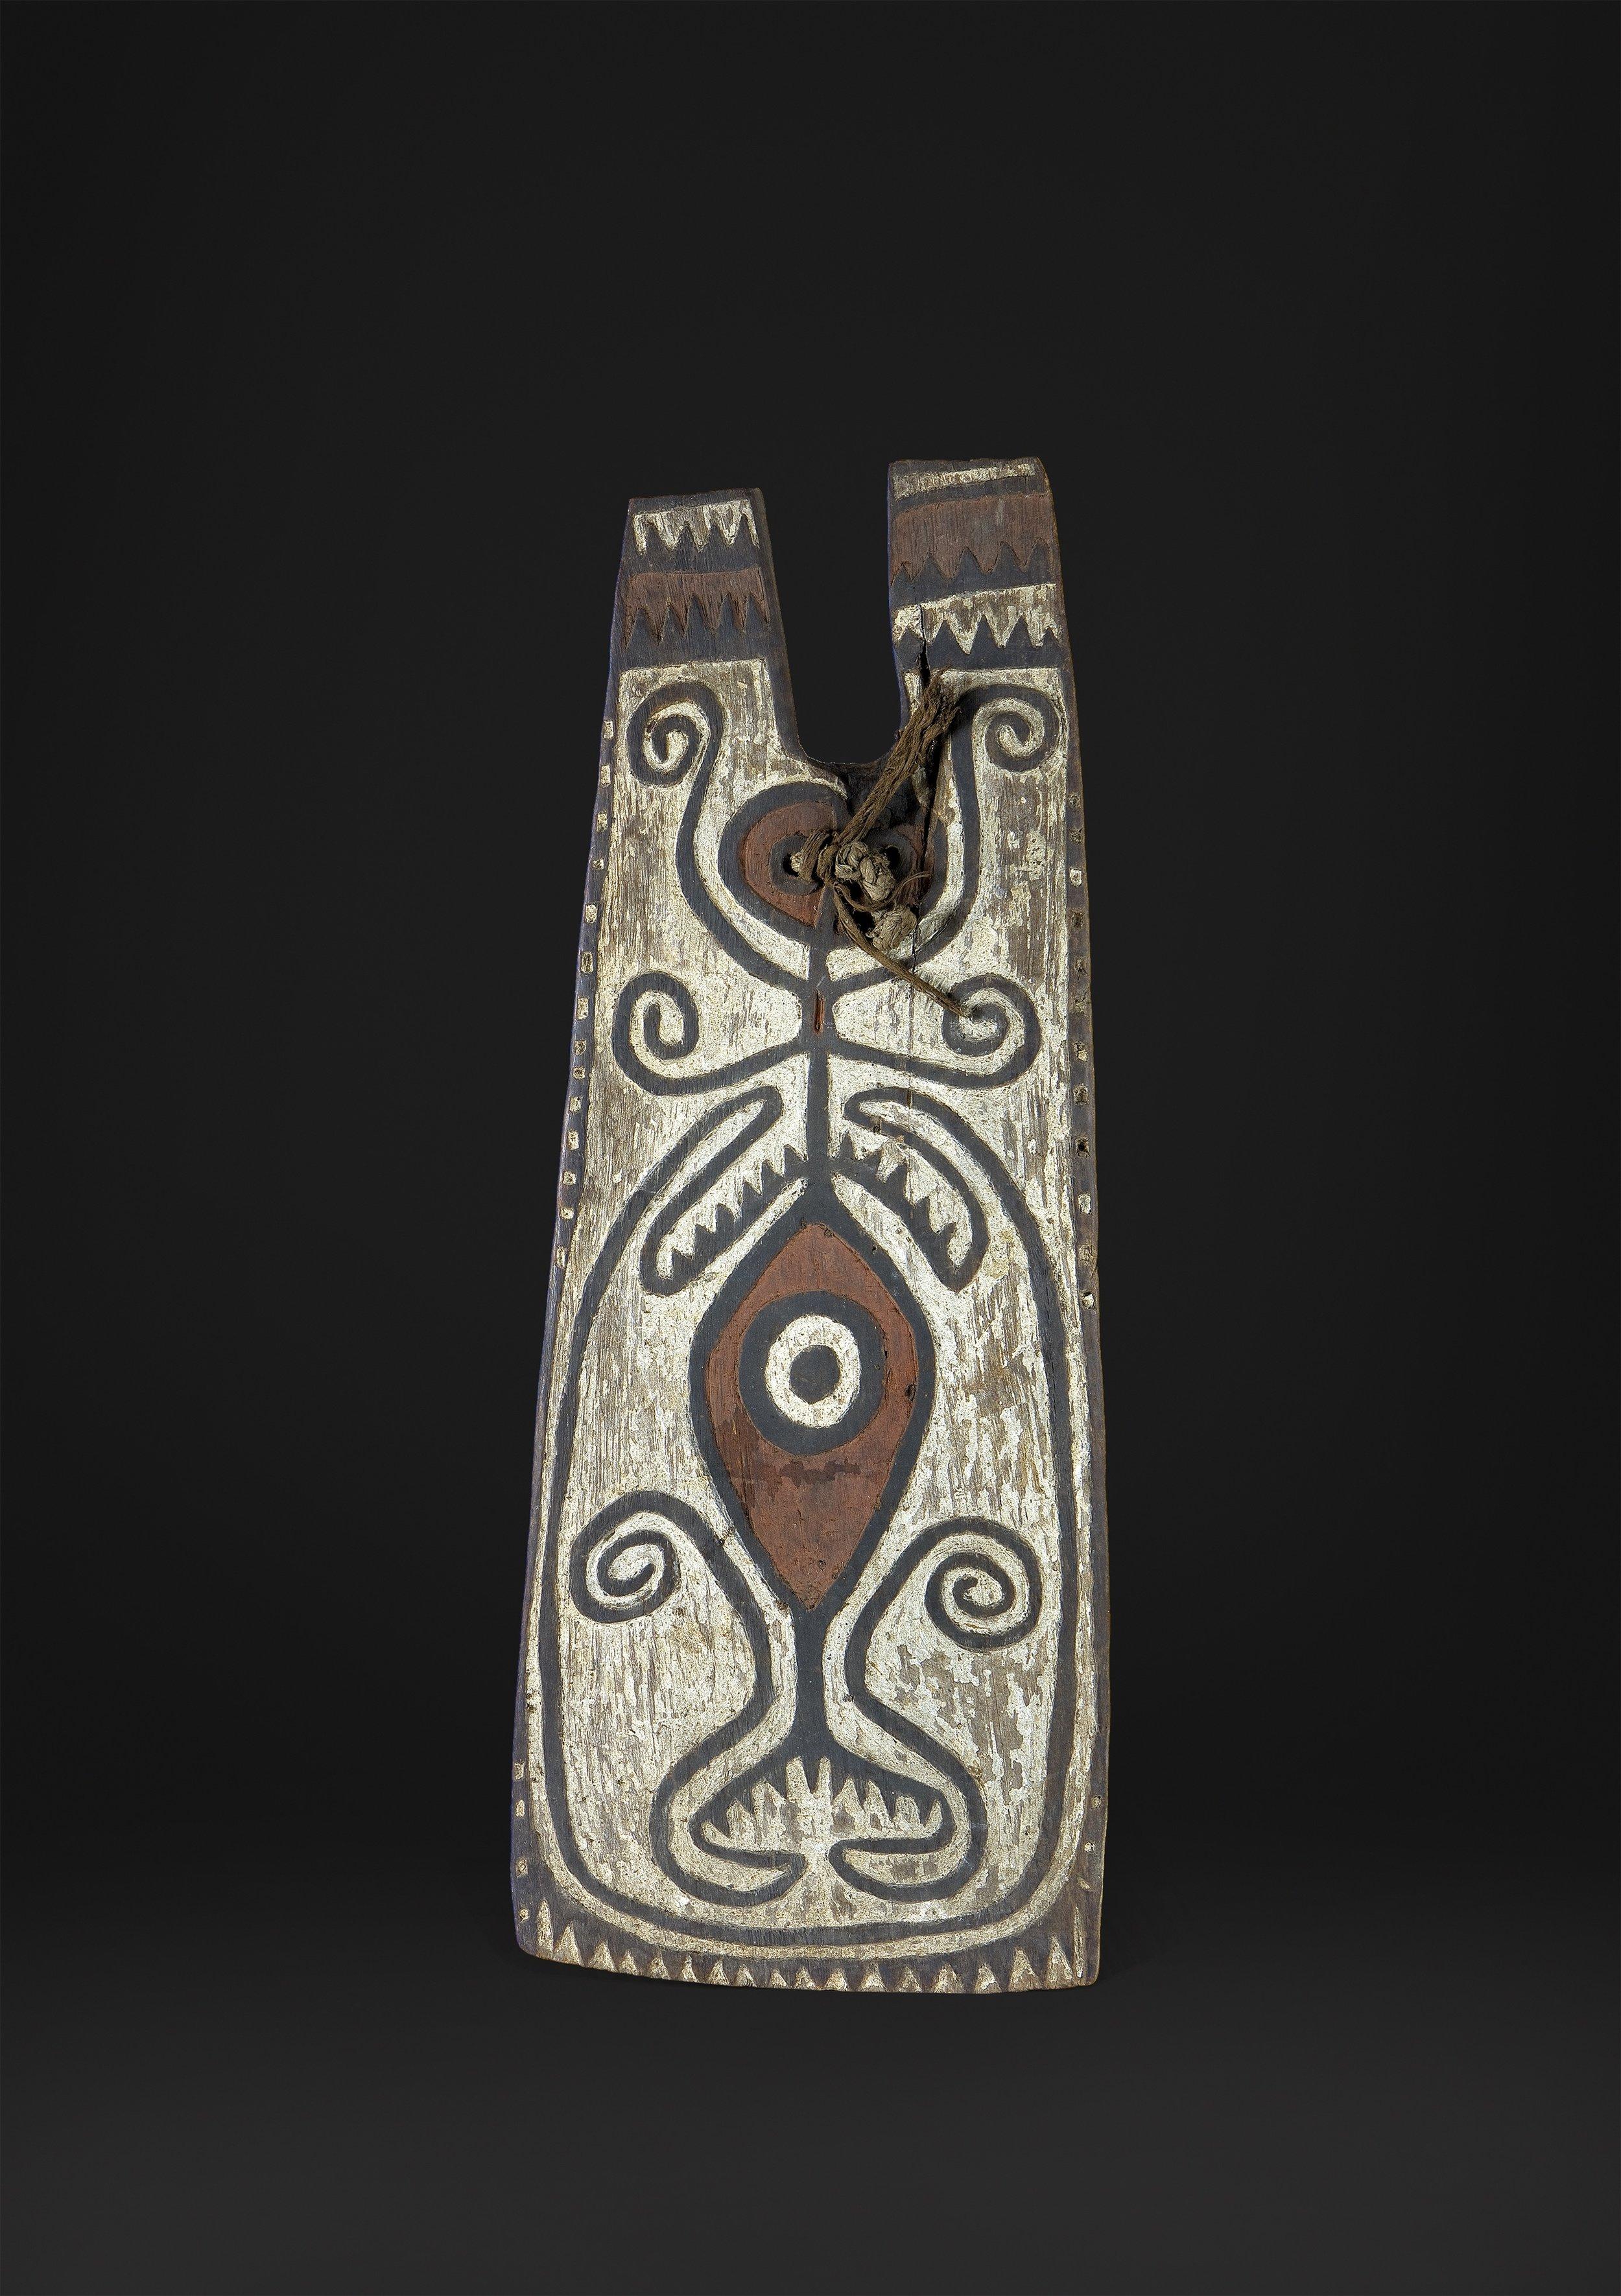 Elema people, Papuan gulf, New Guinea, 19th century, inv. no. E023103, Australian Museum, Sydney. Image courtesy of Bill Evans